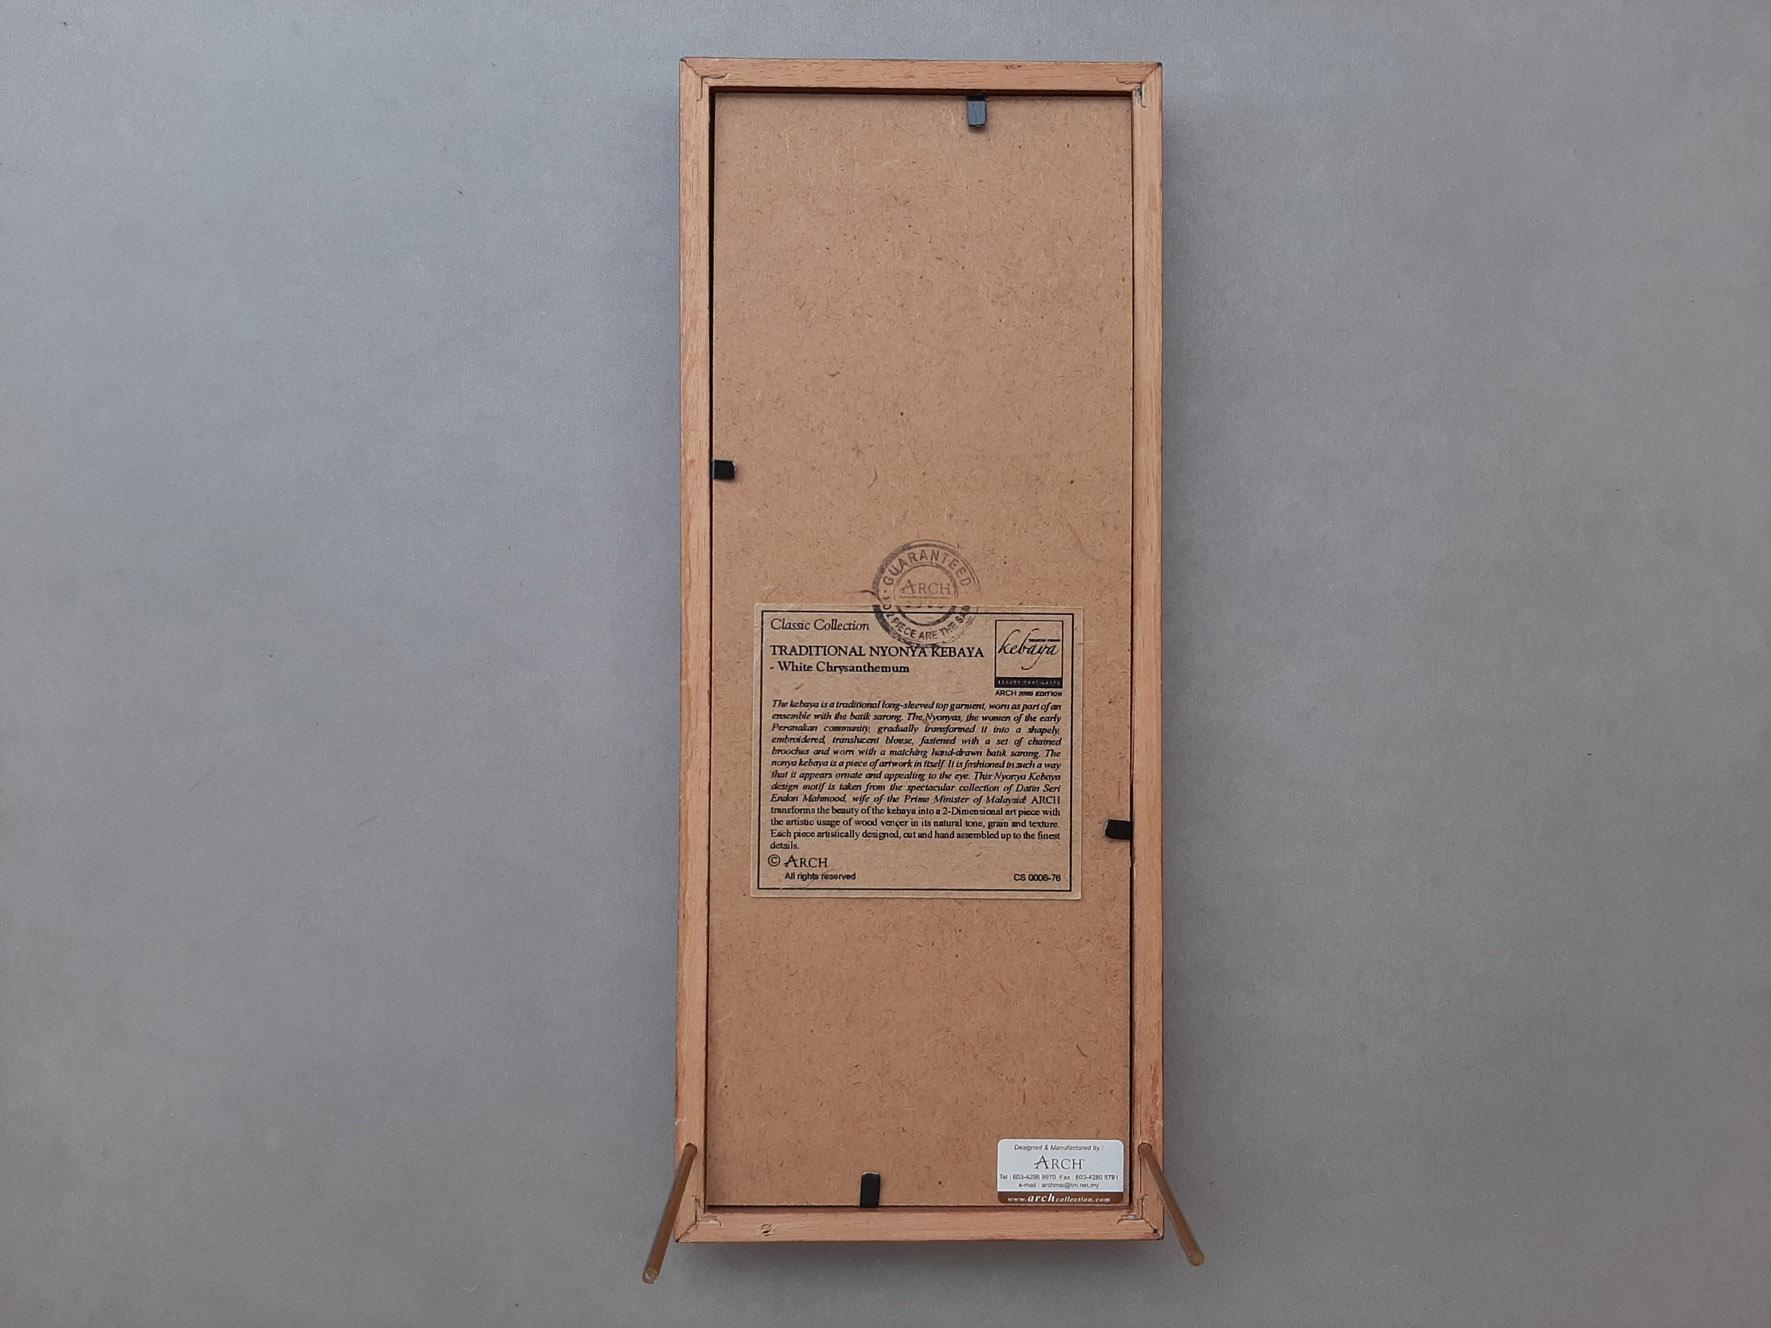 Productfoto lijstje maleisie 2